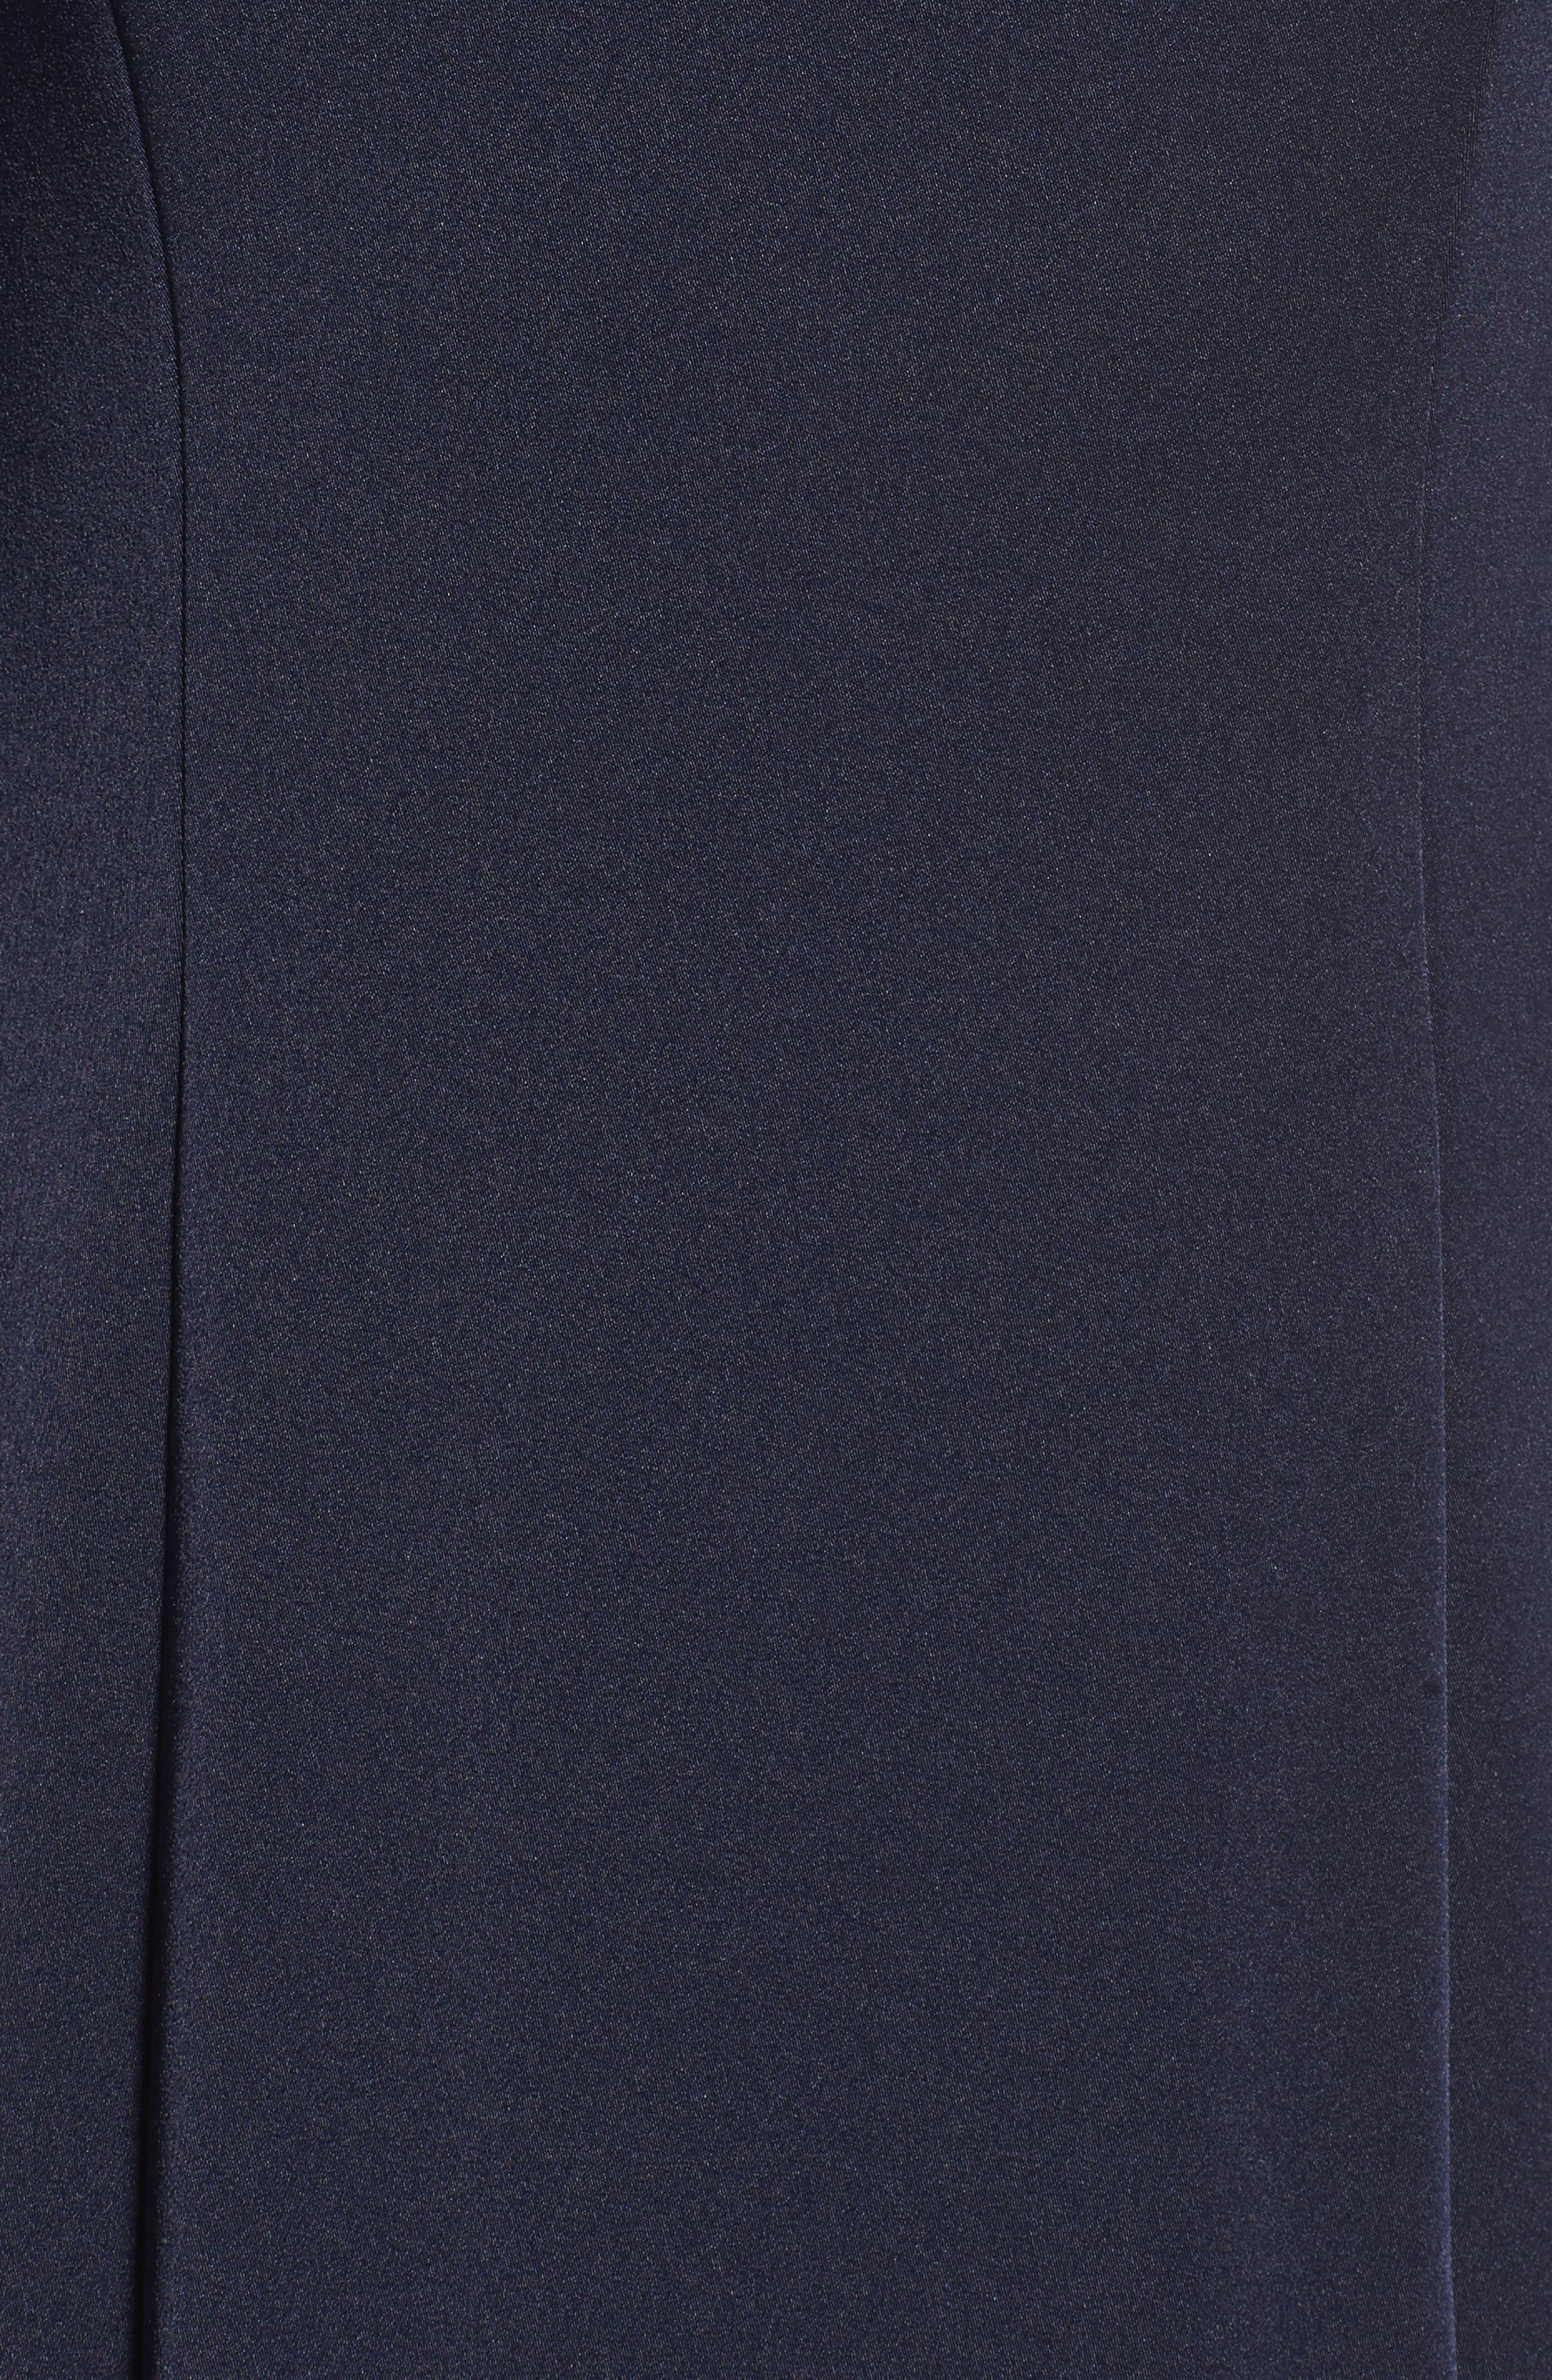 Cape Illusion Gown,                             Alternate thumbnail 5, color,                             NAVY